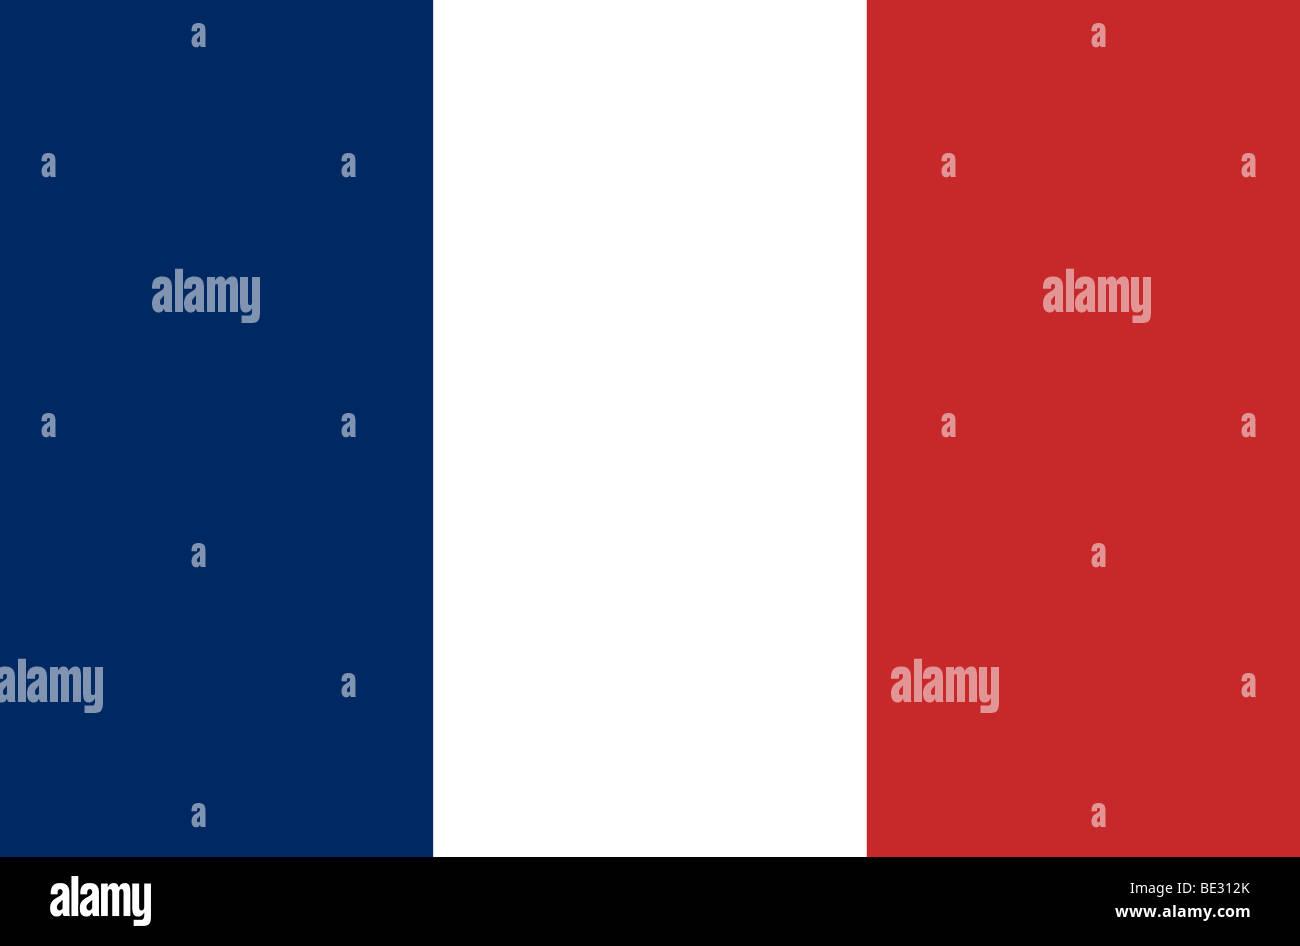 French flag illustration - Stock Image